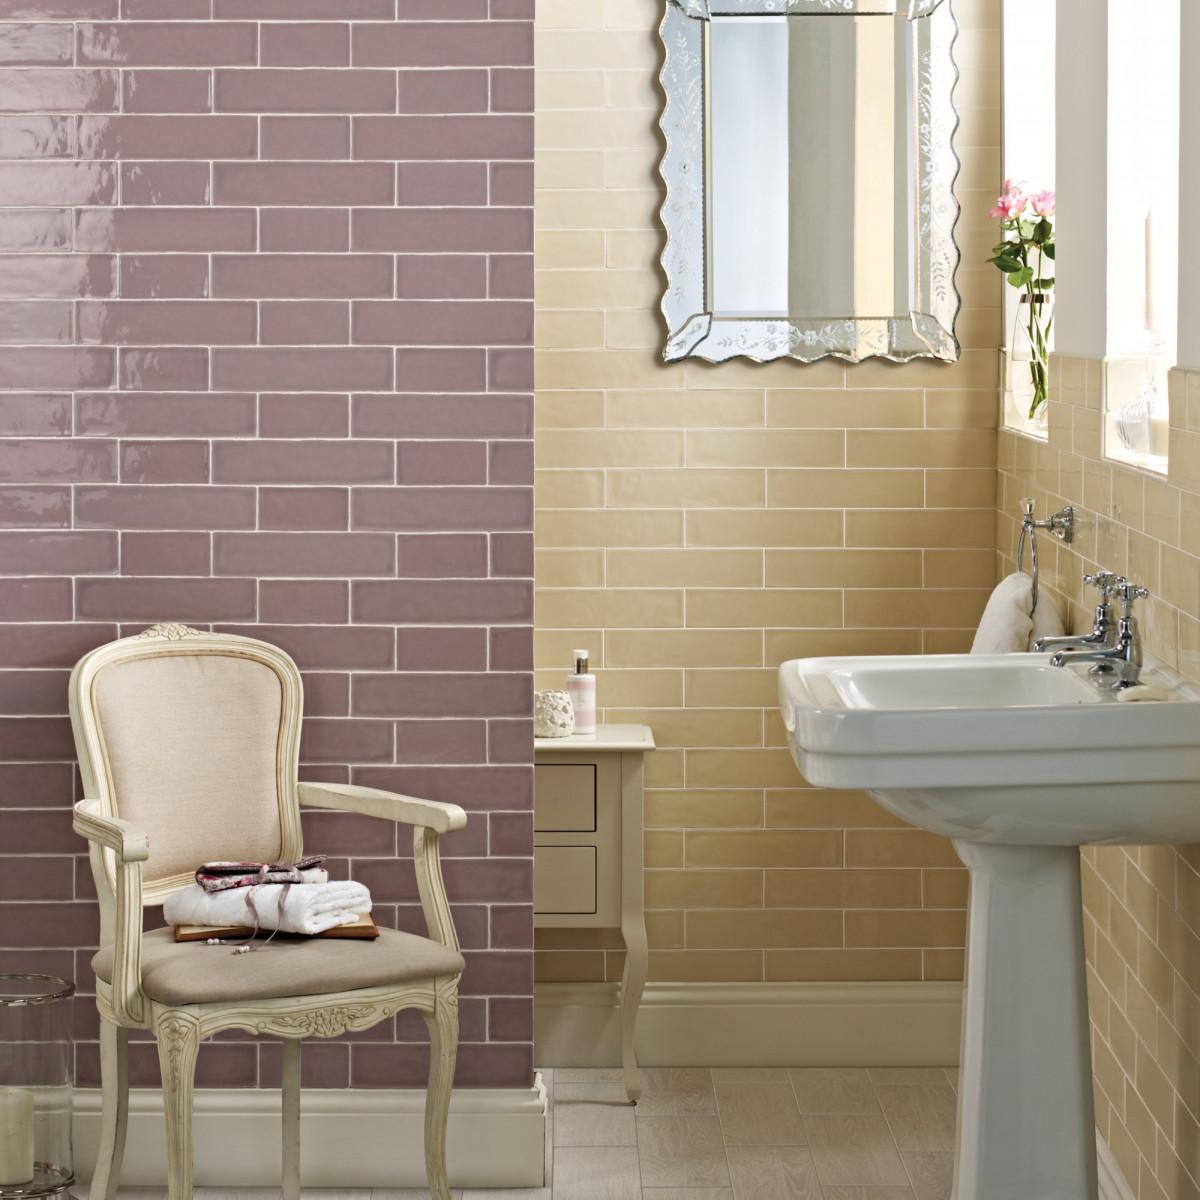 Laura ashley artisan amethyst wall british ceramic tile dailygadgetfo Images